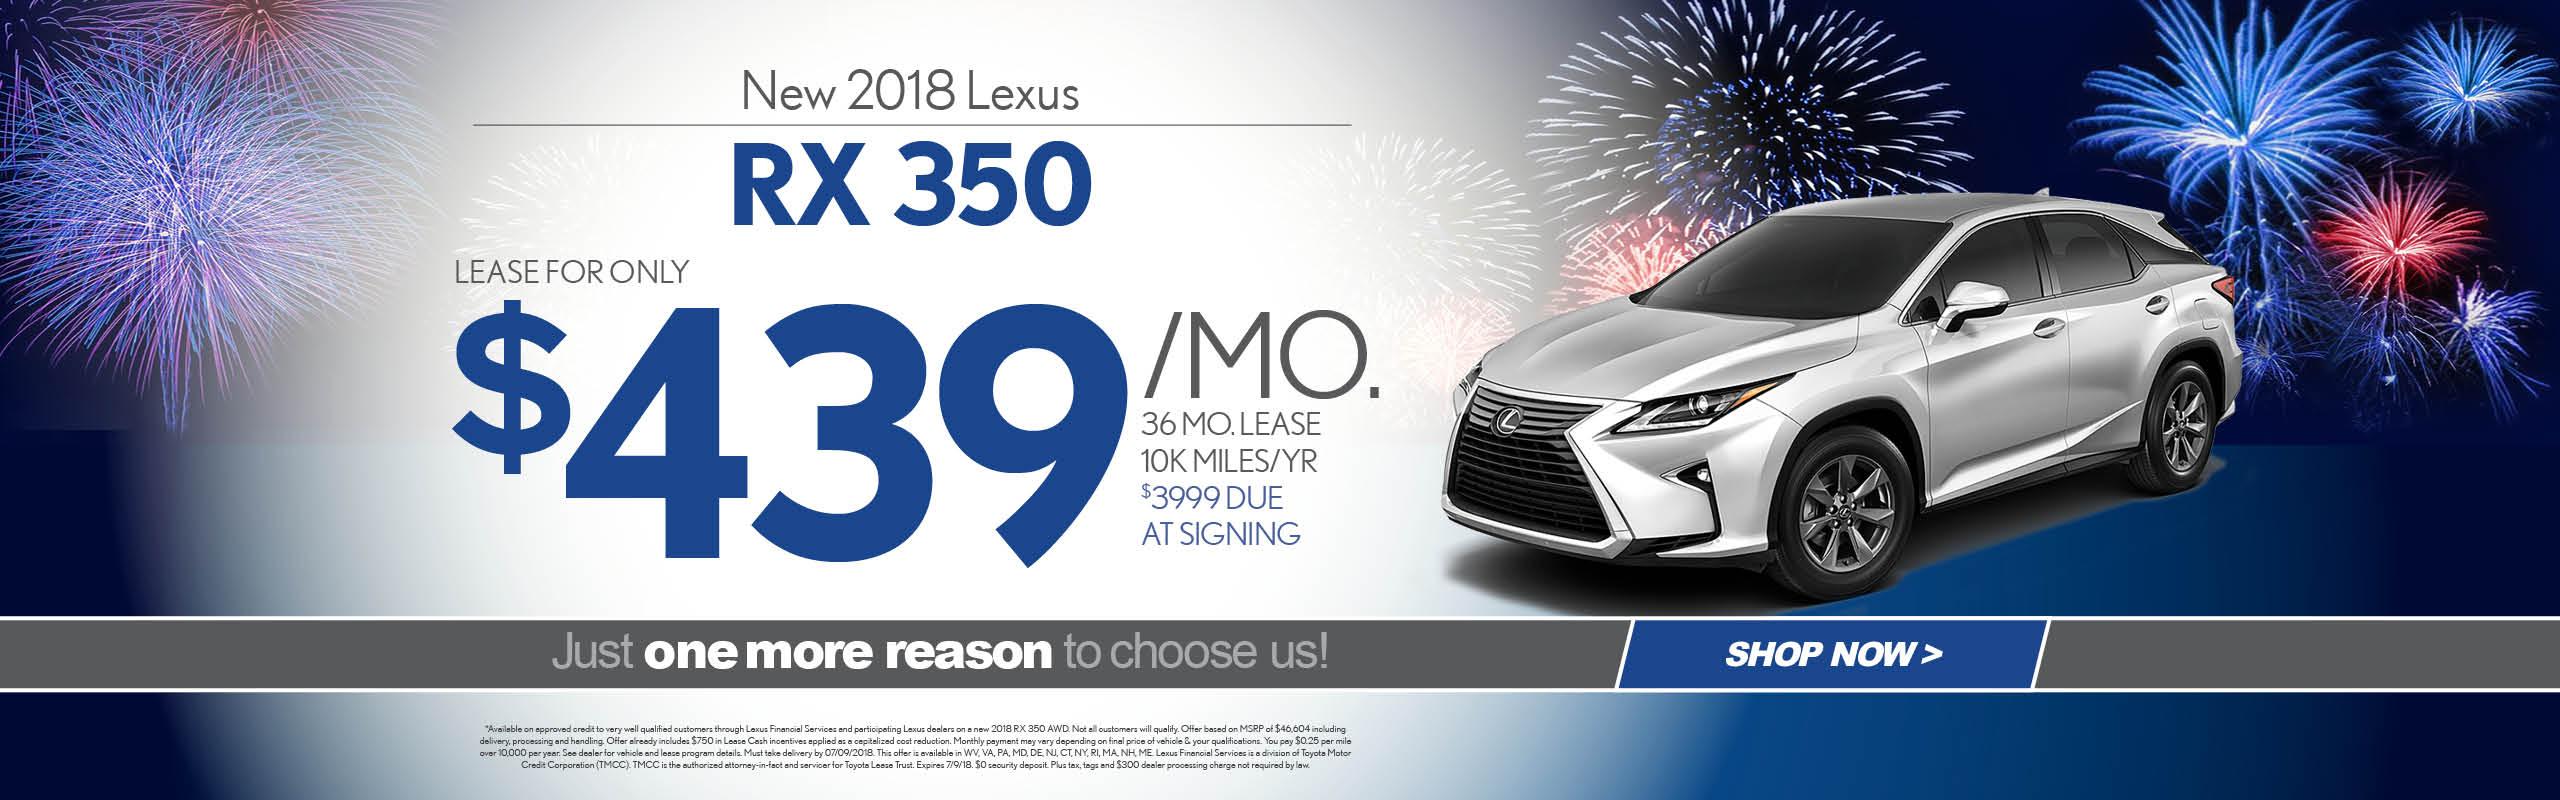 juan special san lexus new de offers car pr used dealer